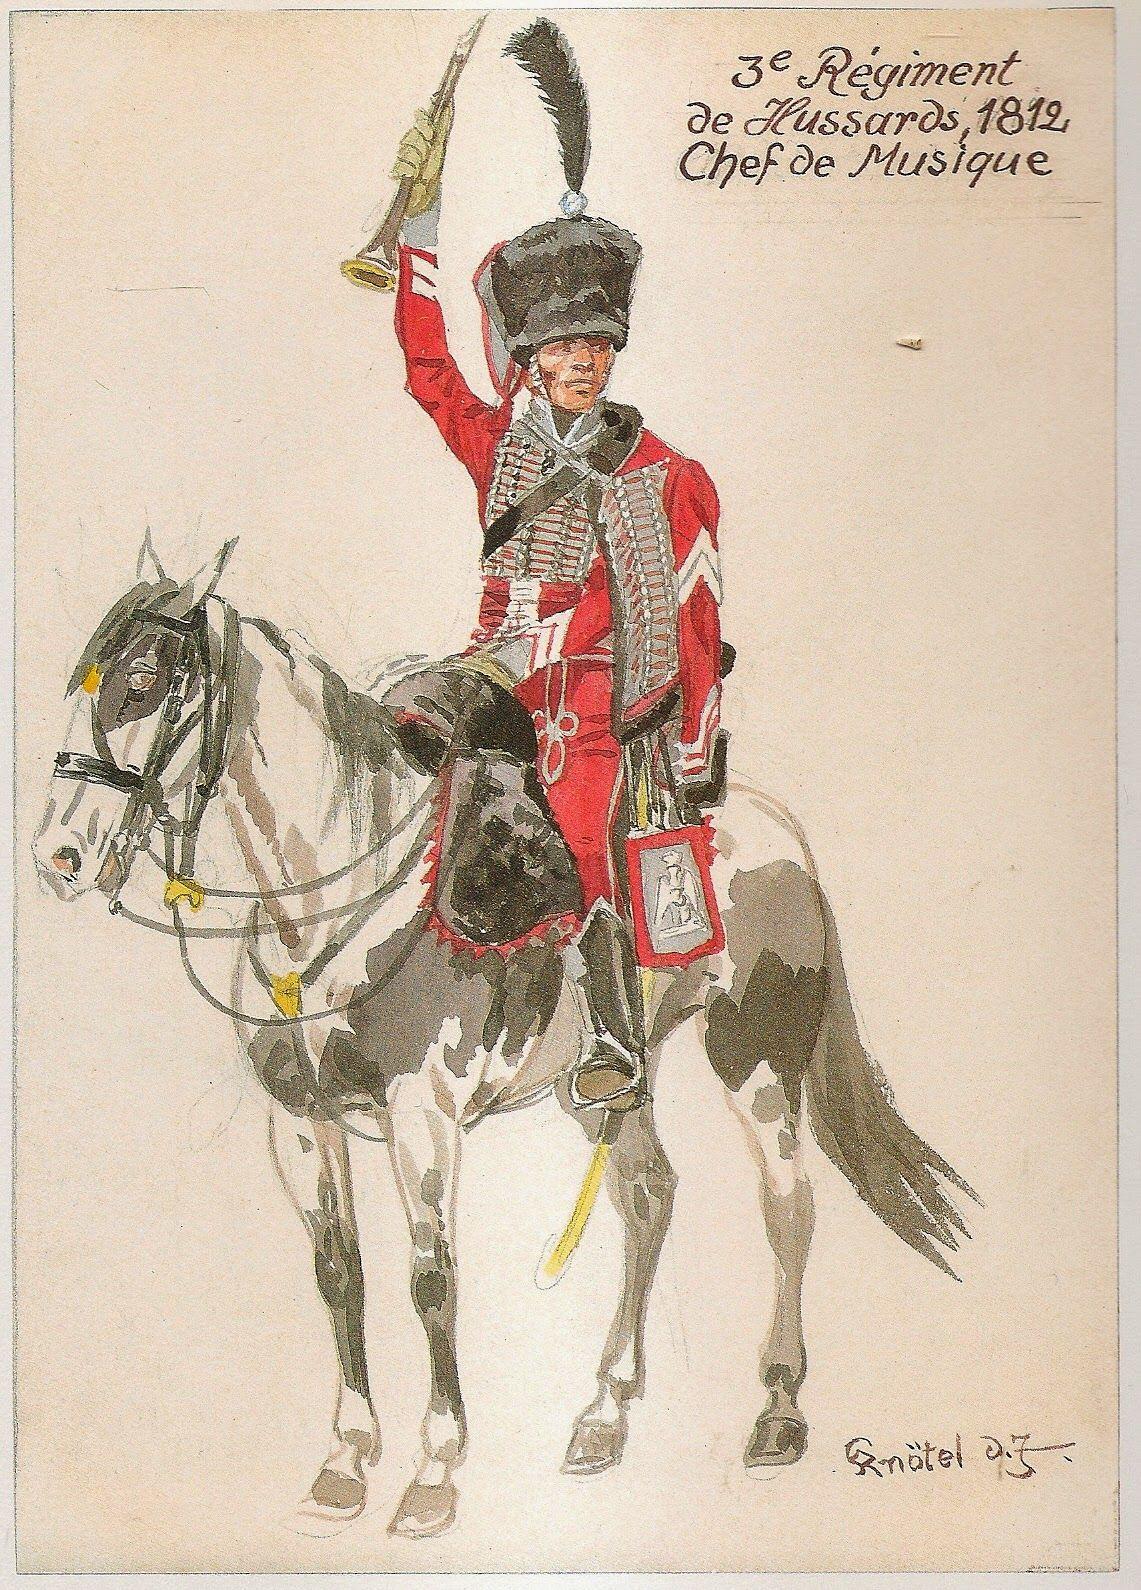 Chef De Musique 3rd Hussars 1812